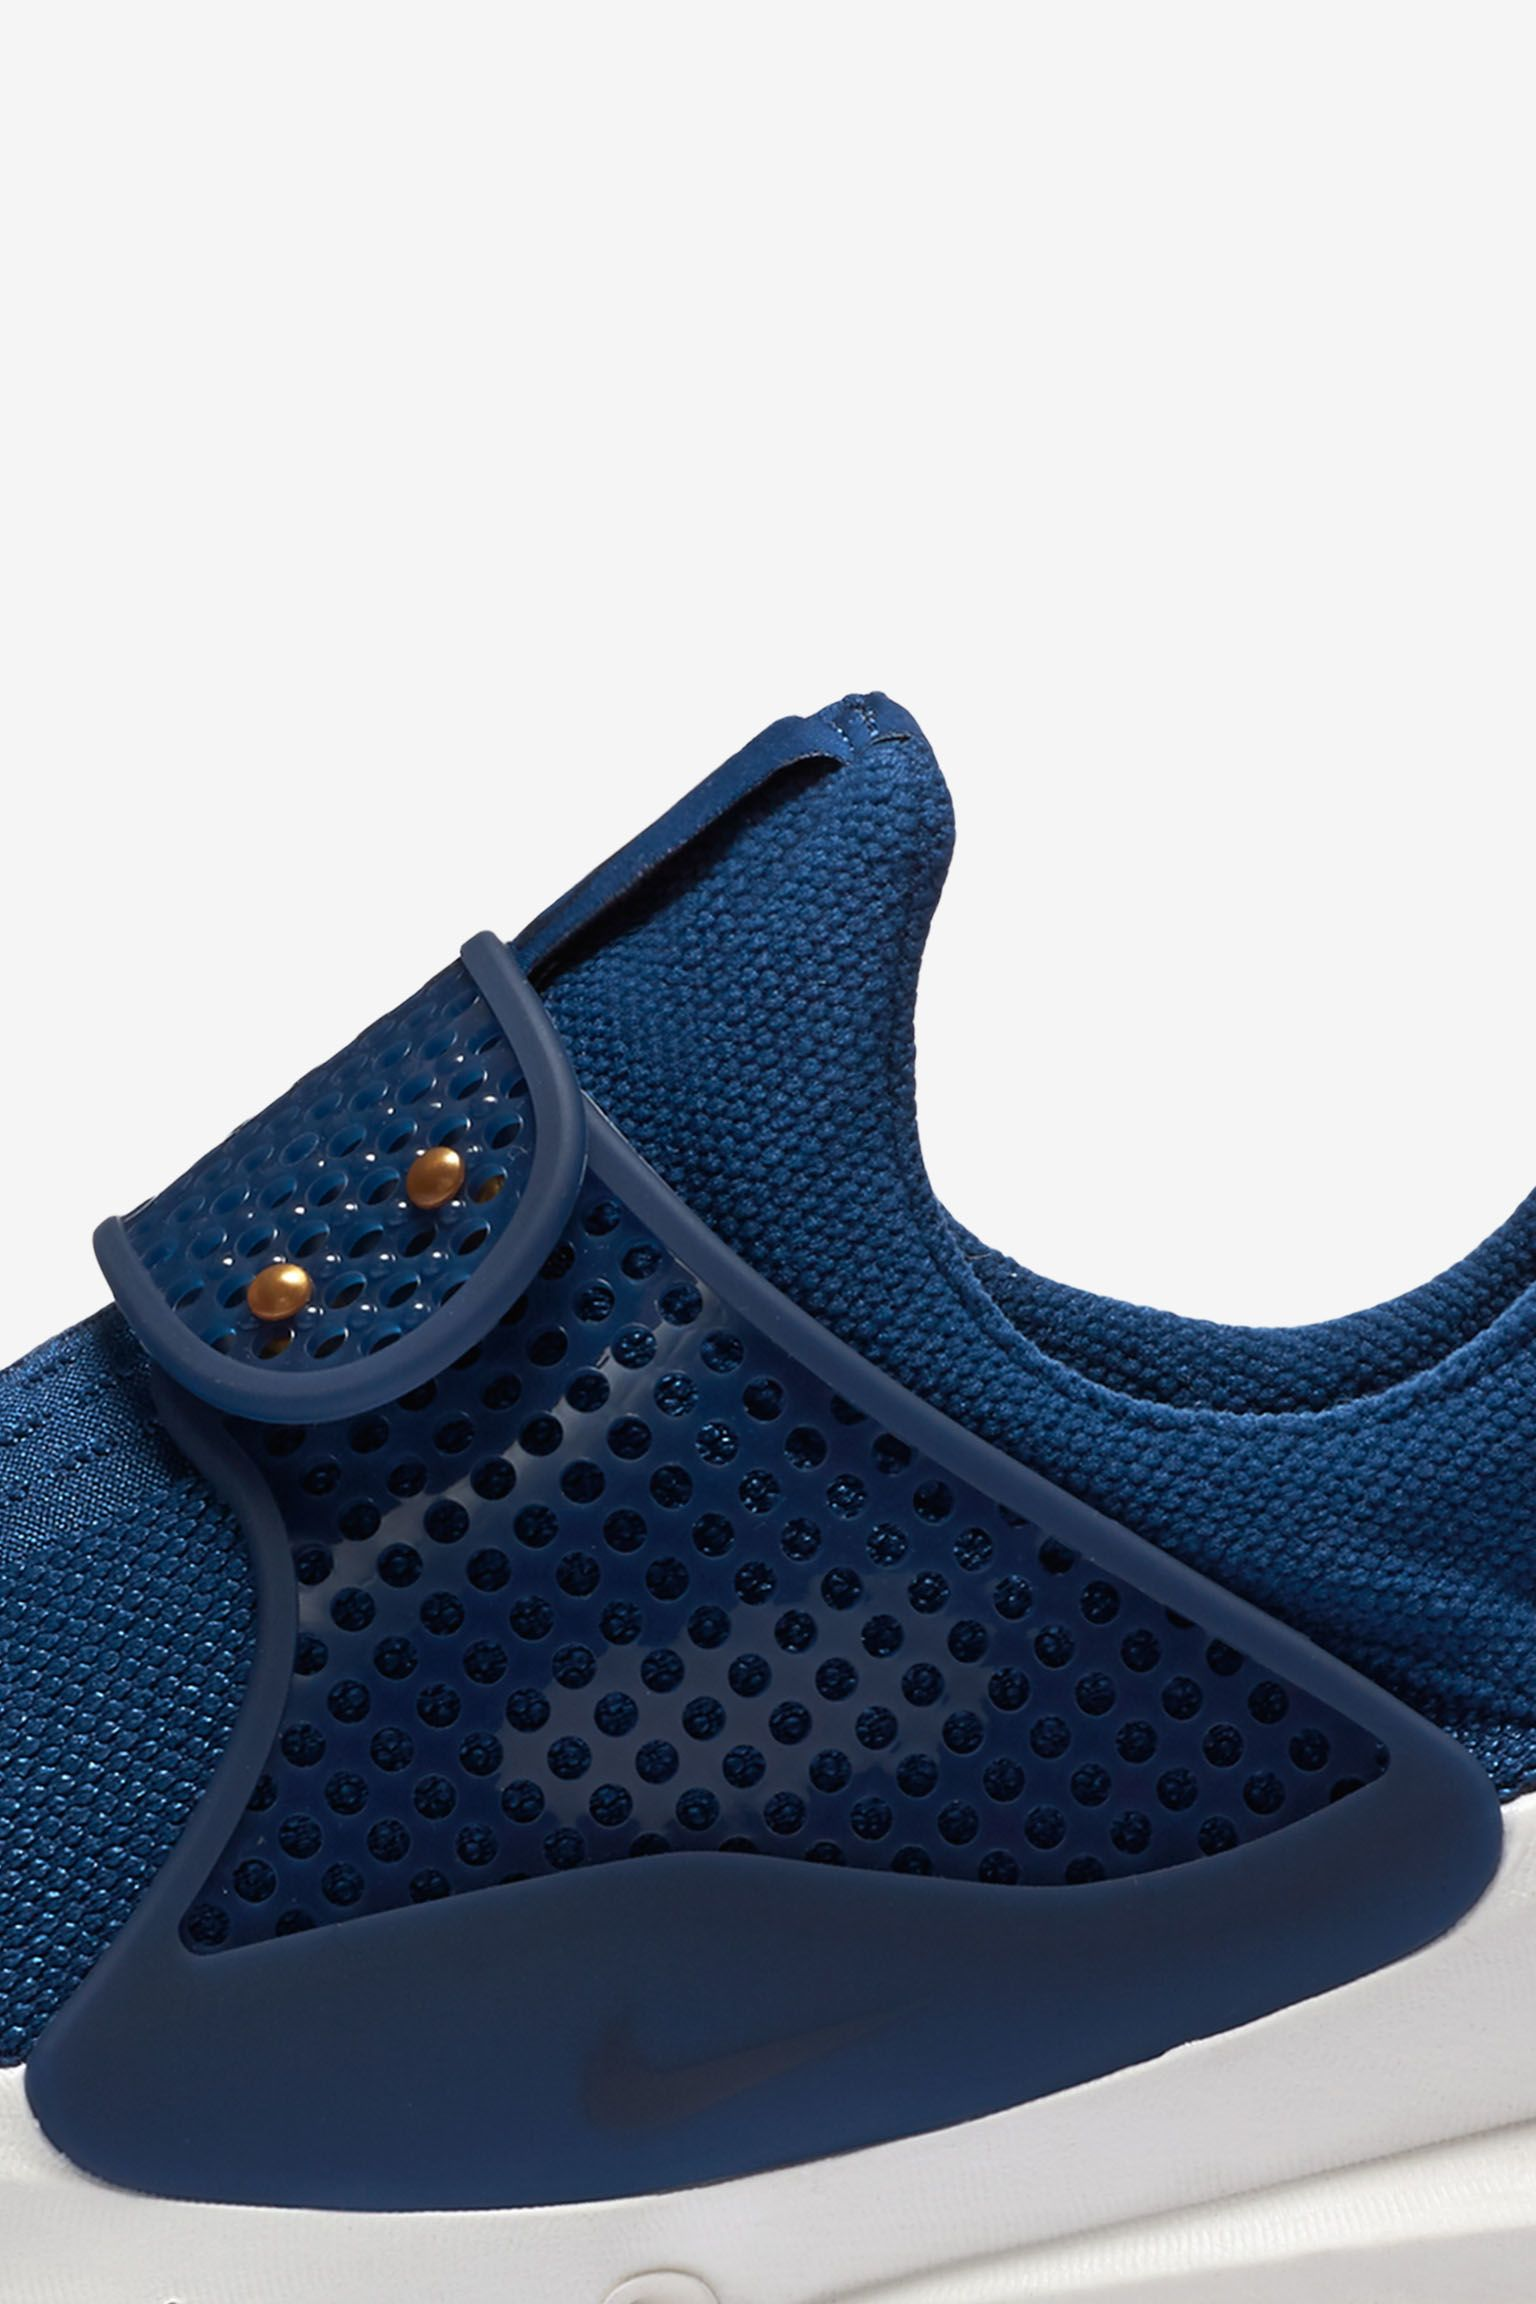 Women's Nike Sock Dart 'International'